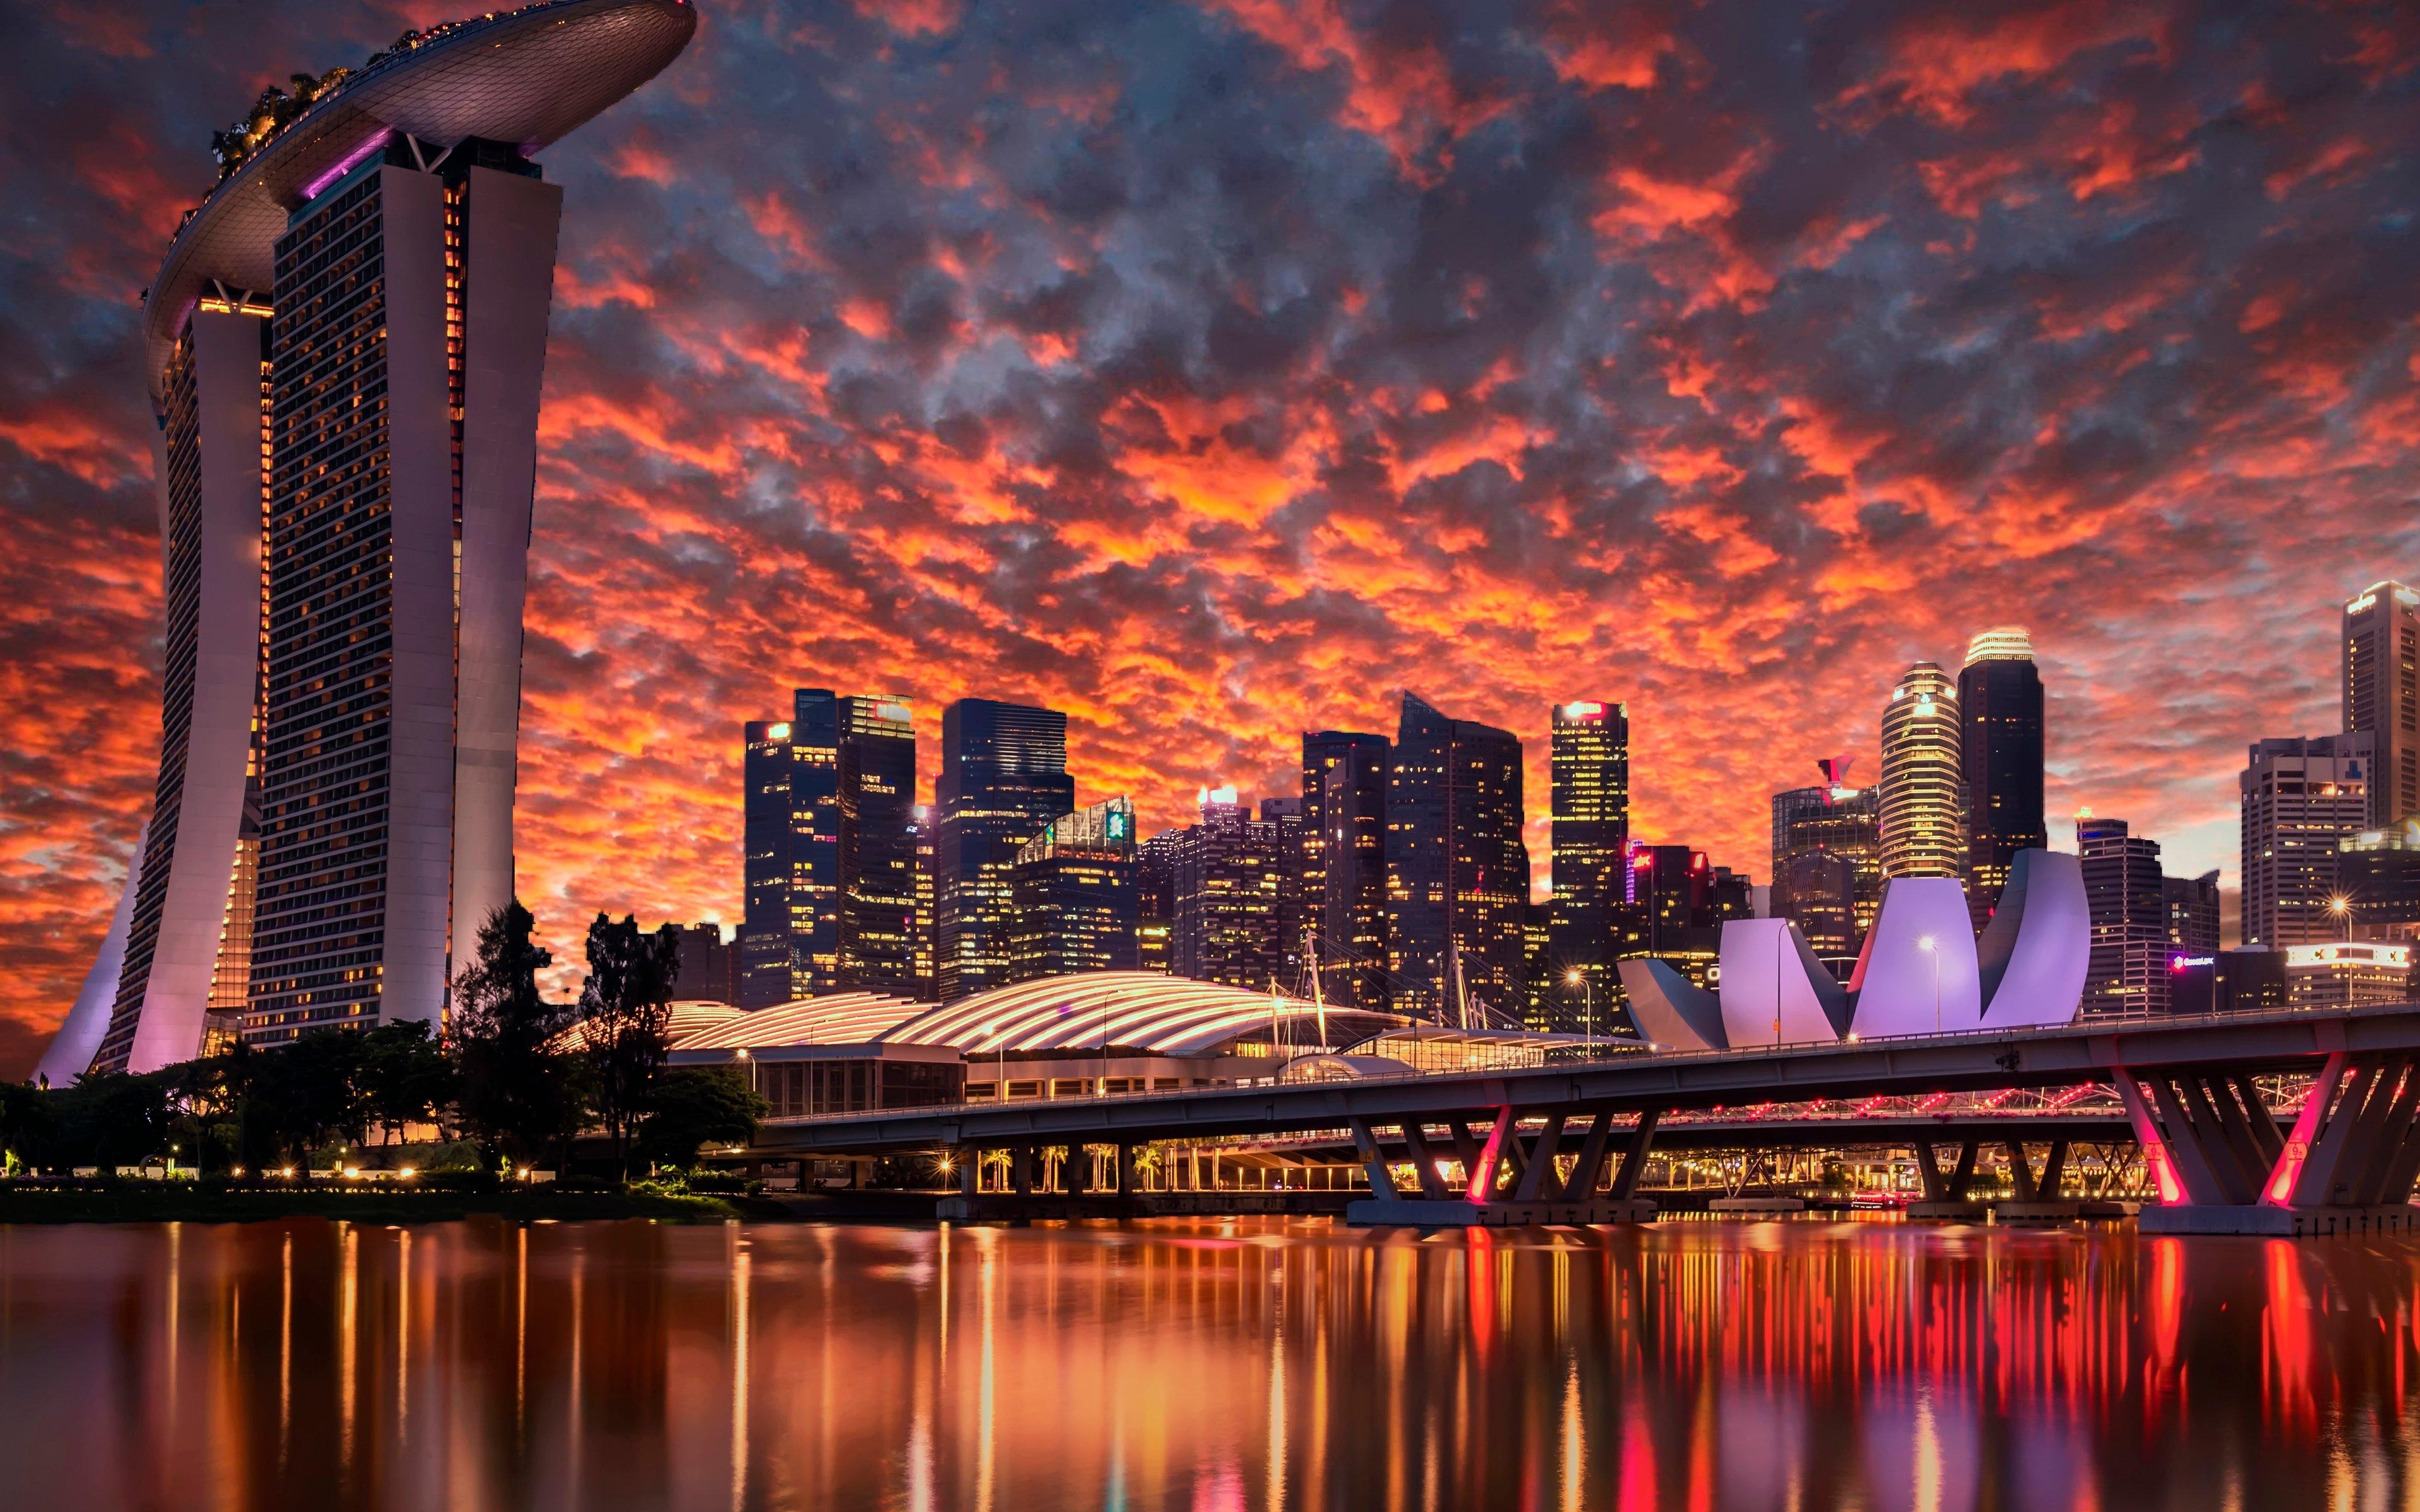 Fondos de pantalla Rascacielos de en la marina Singapur